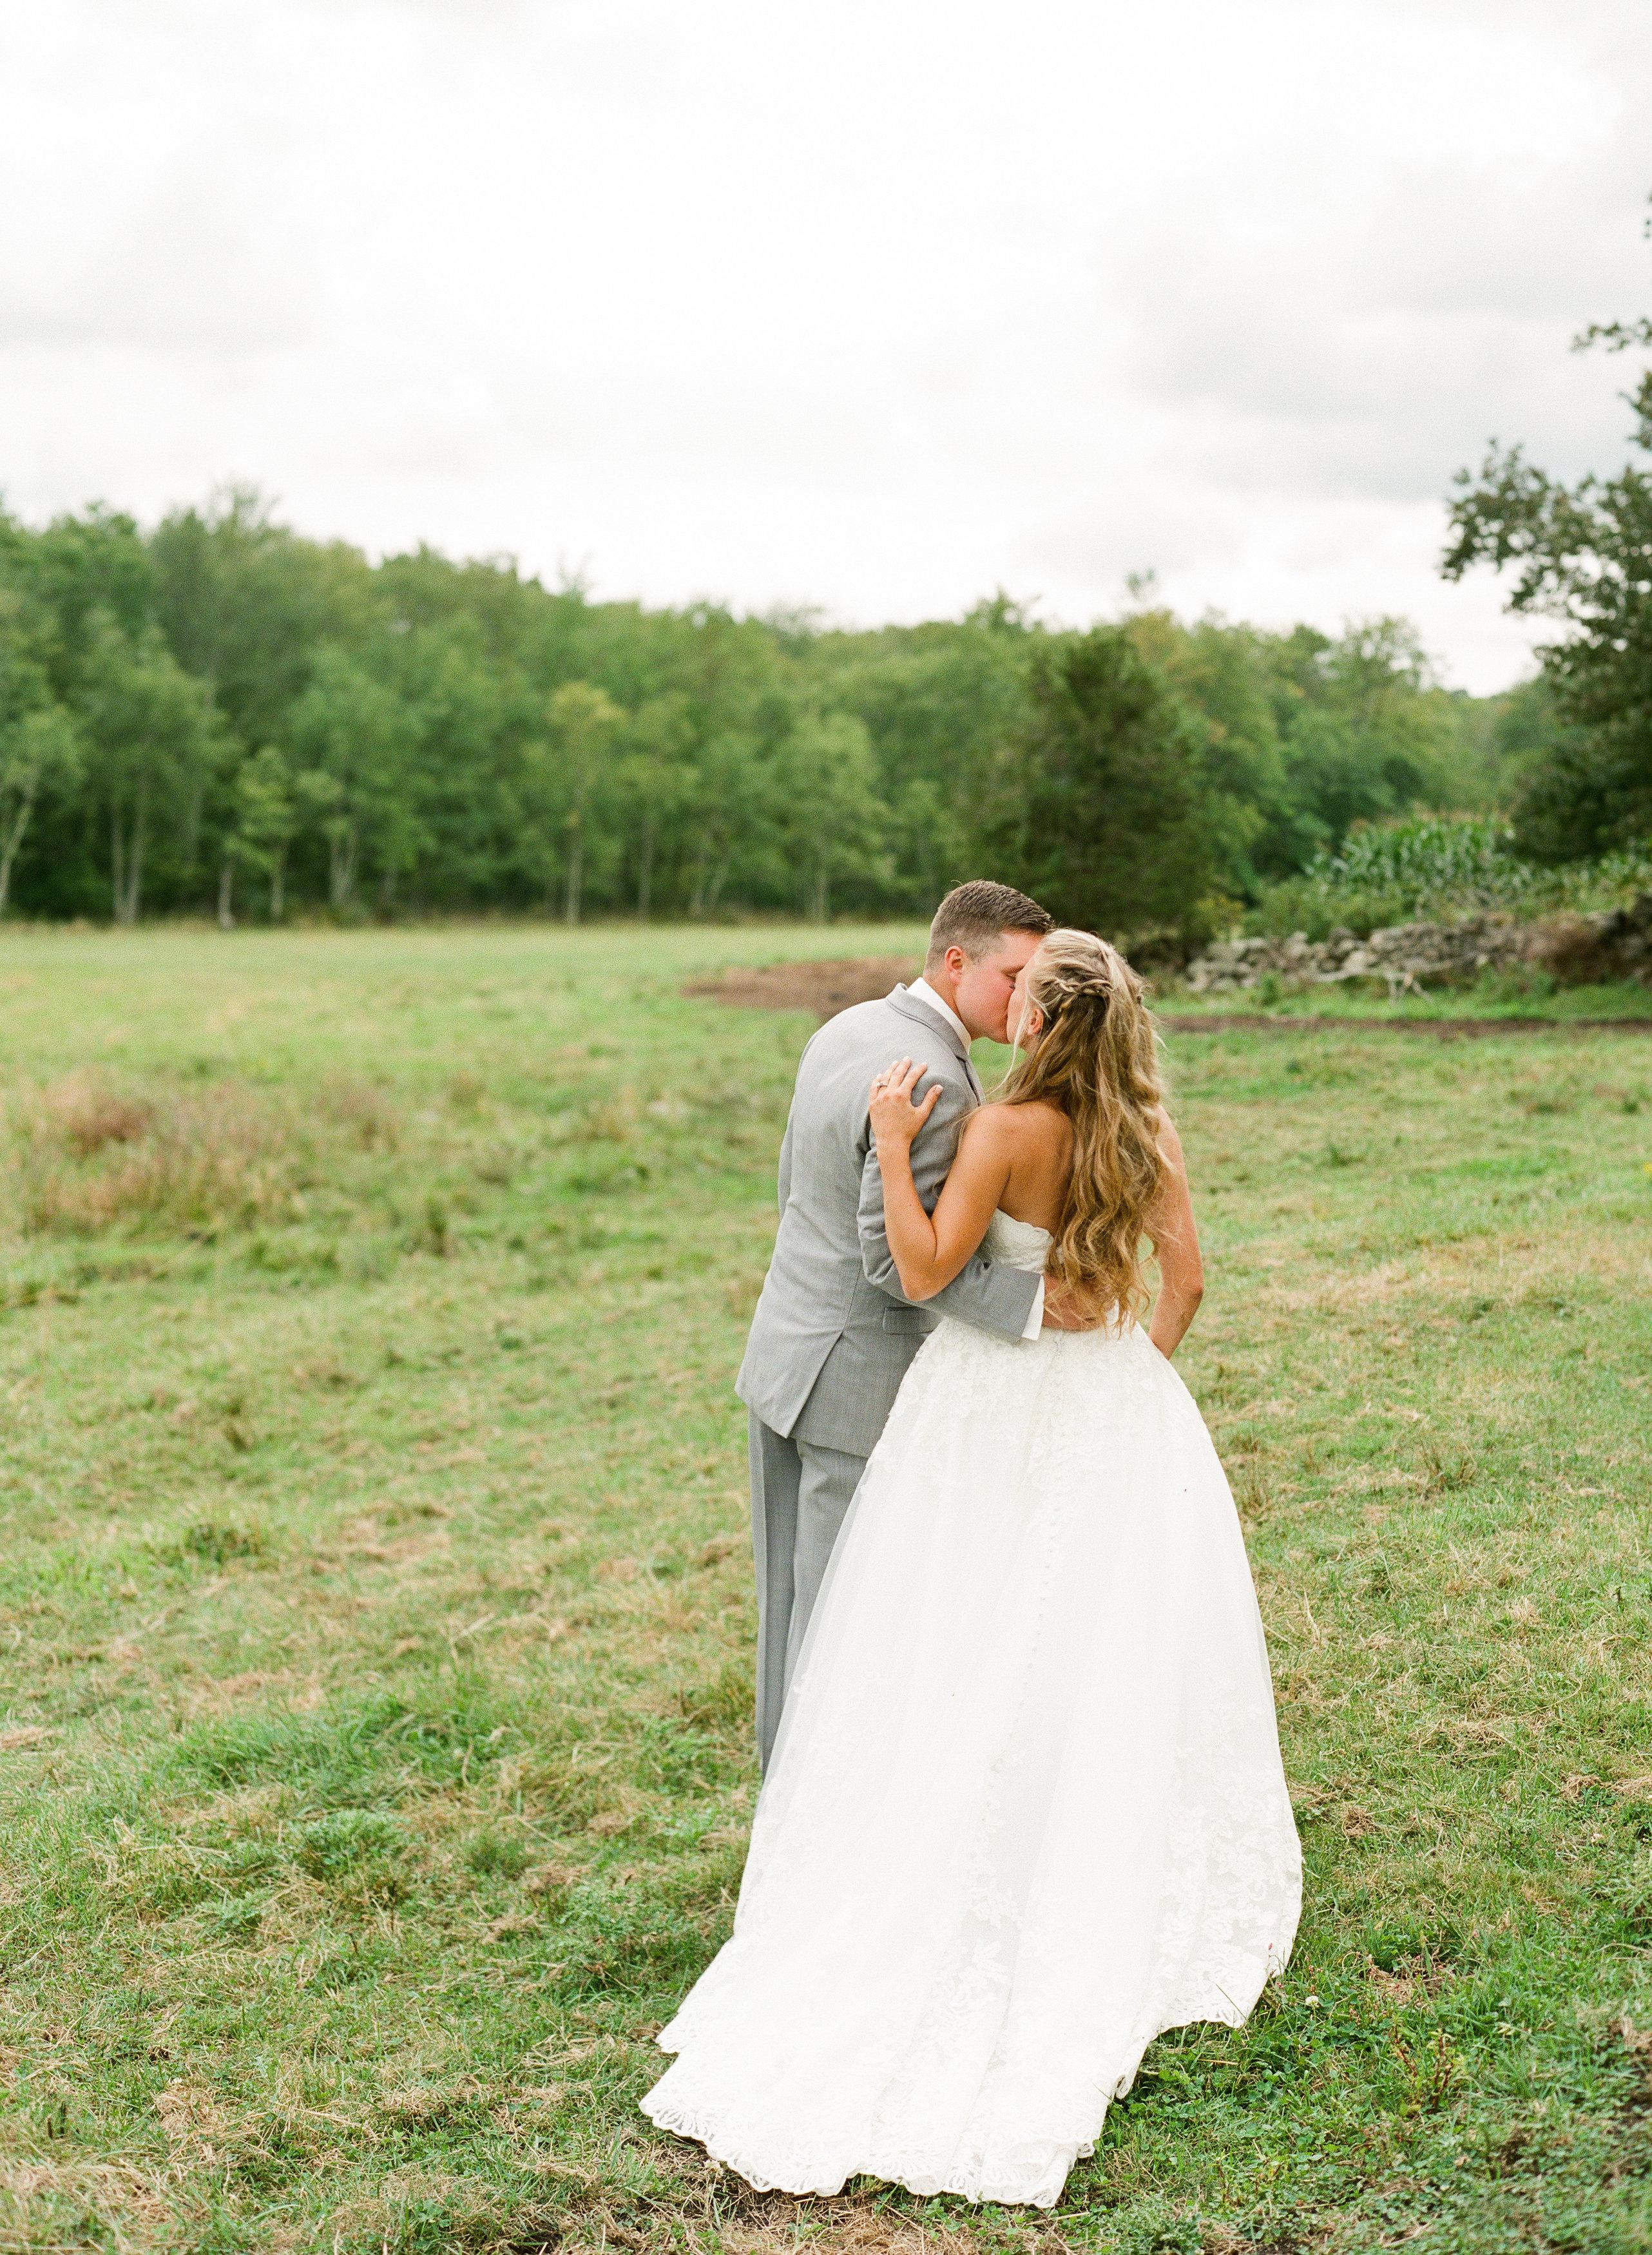 Stephanie&Dan-Wedding-LindsayMaddenPhotographyII-66